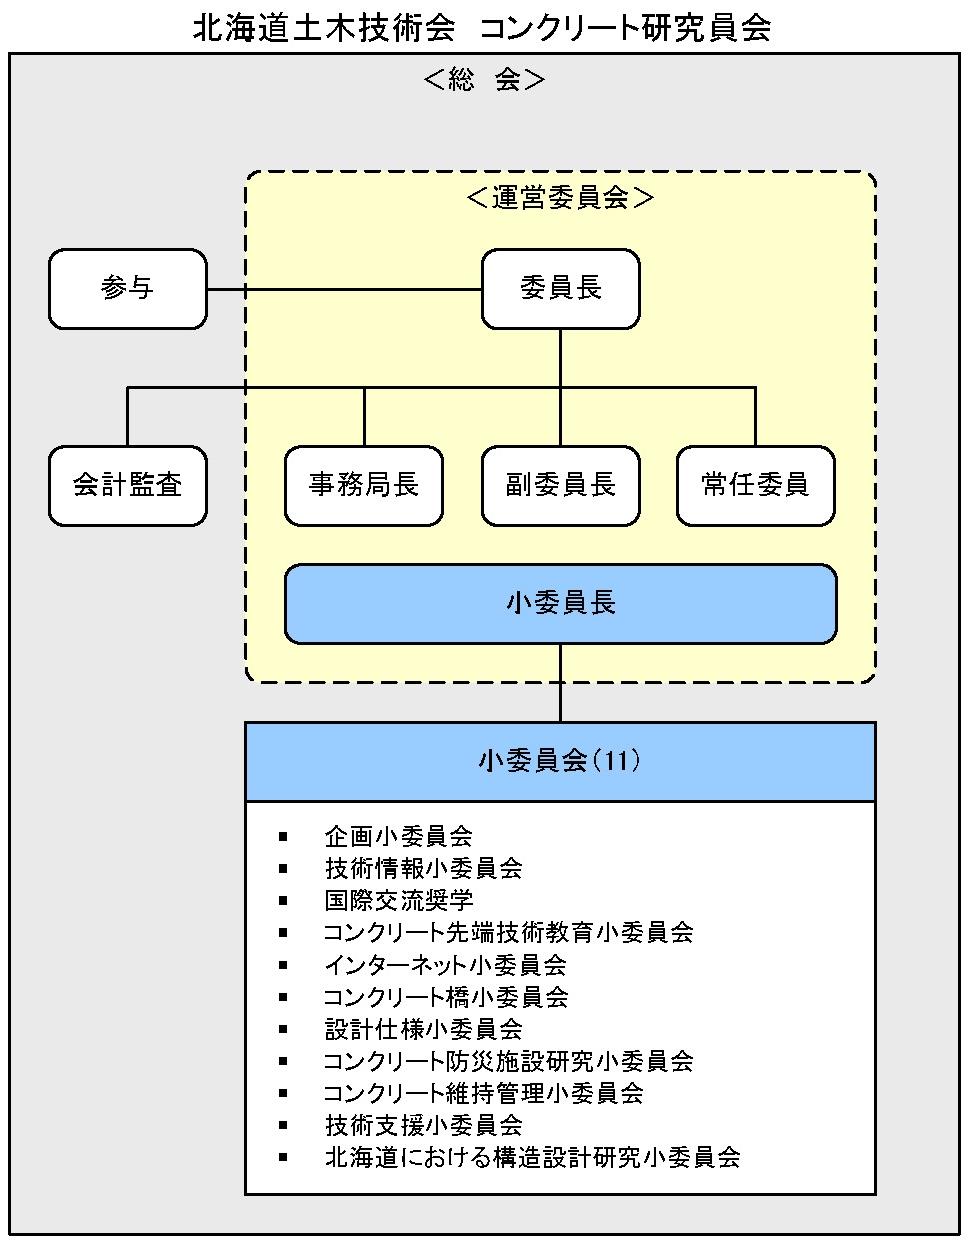 OrganizationChart.jpg3